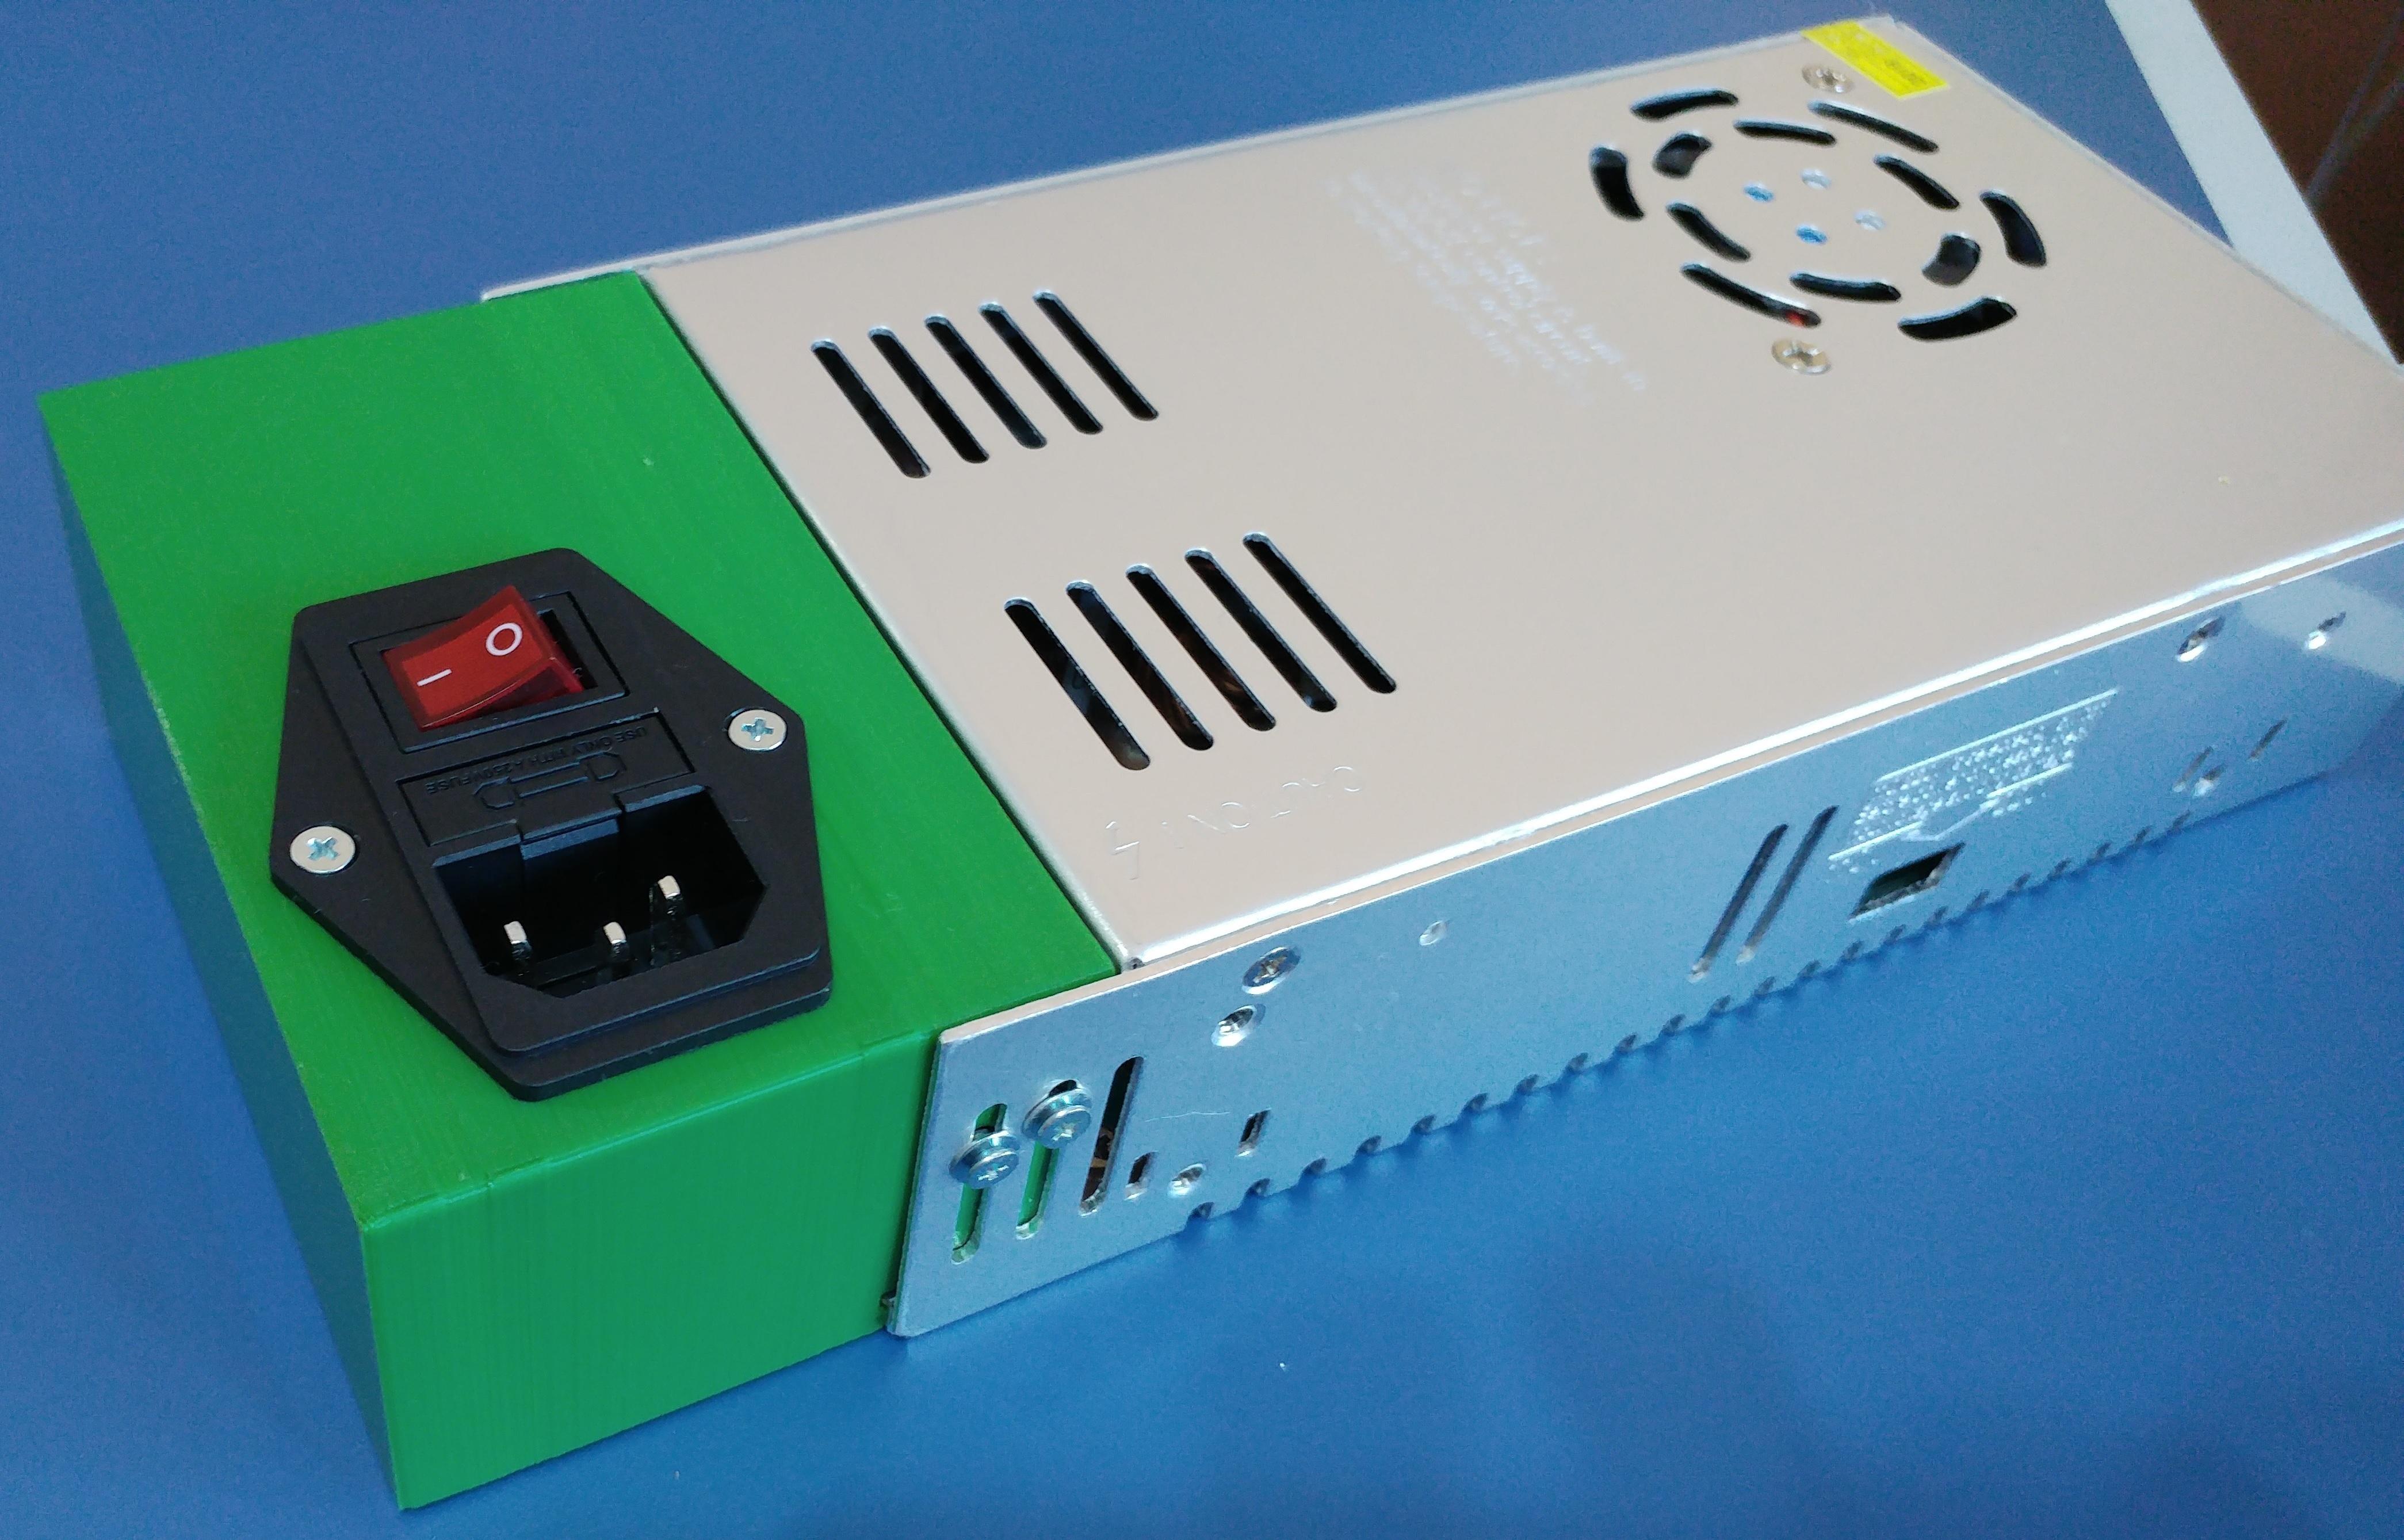 0.jpg Télécharger fichier STL gratuit Carcasa Fuente de Alimentación con interruptor de encendido • Plan pour imprimante 3D, celtarra12